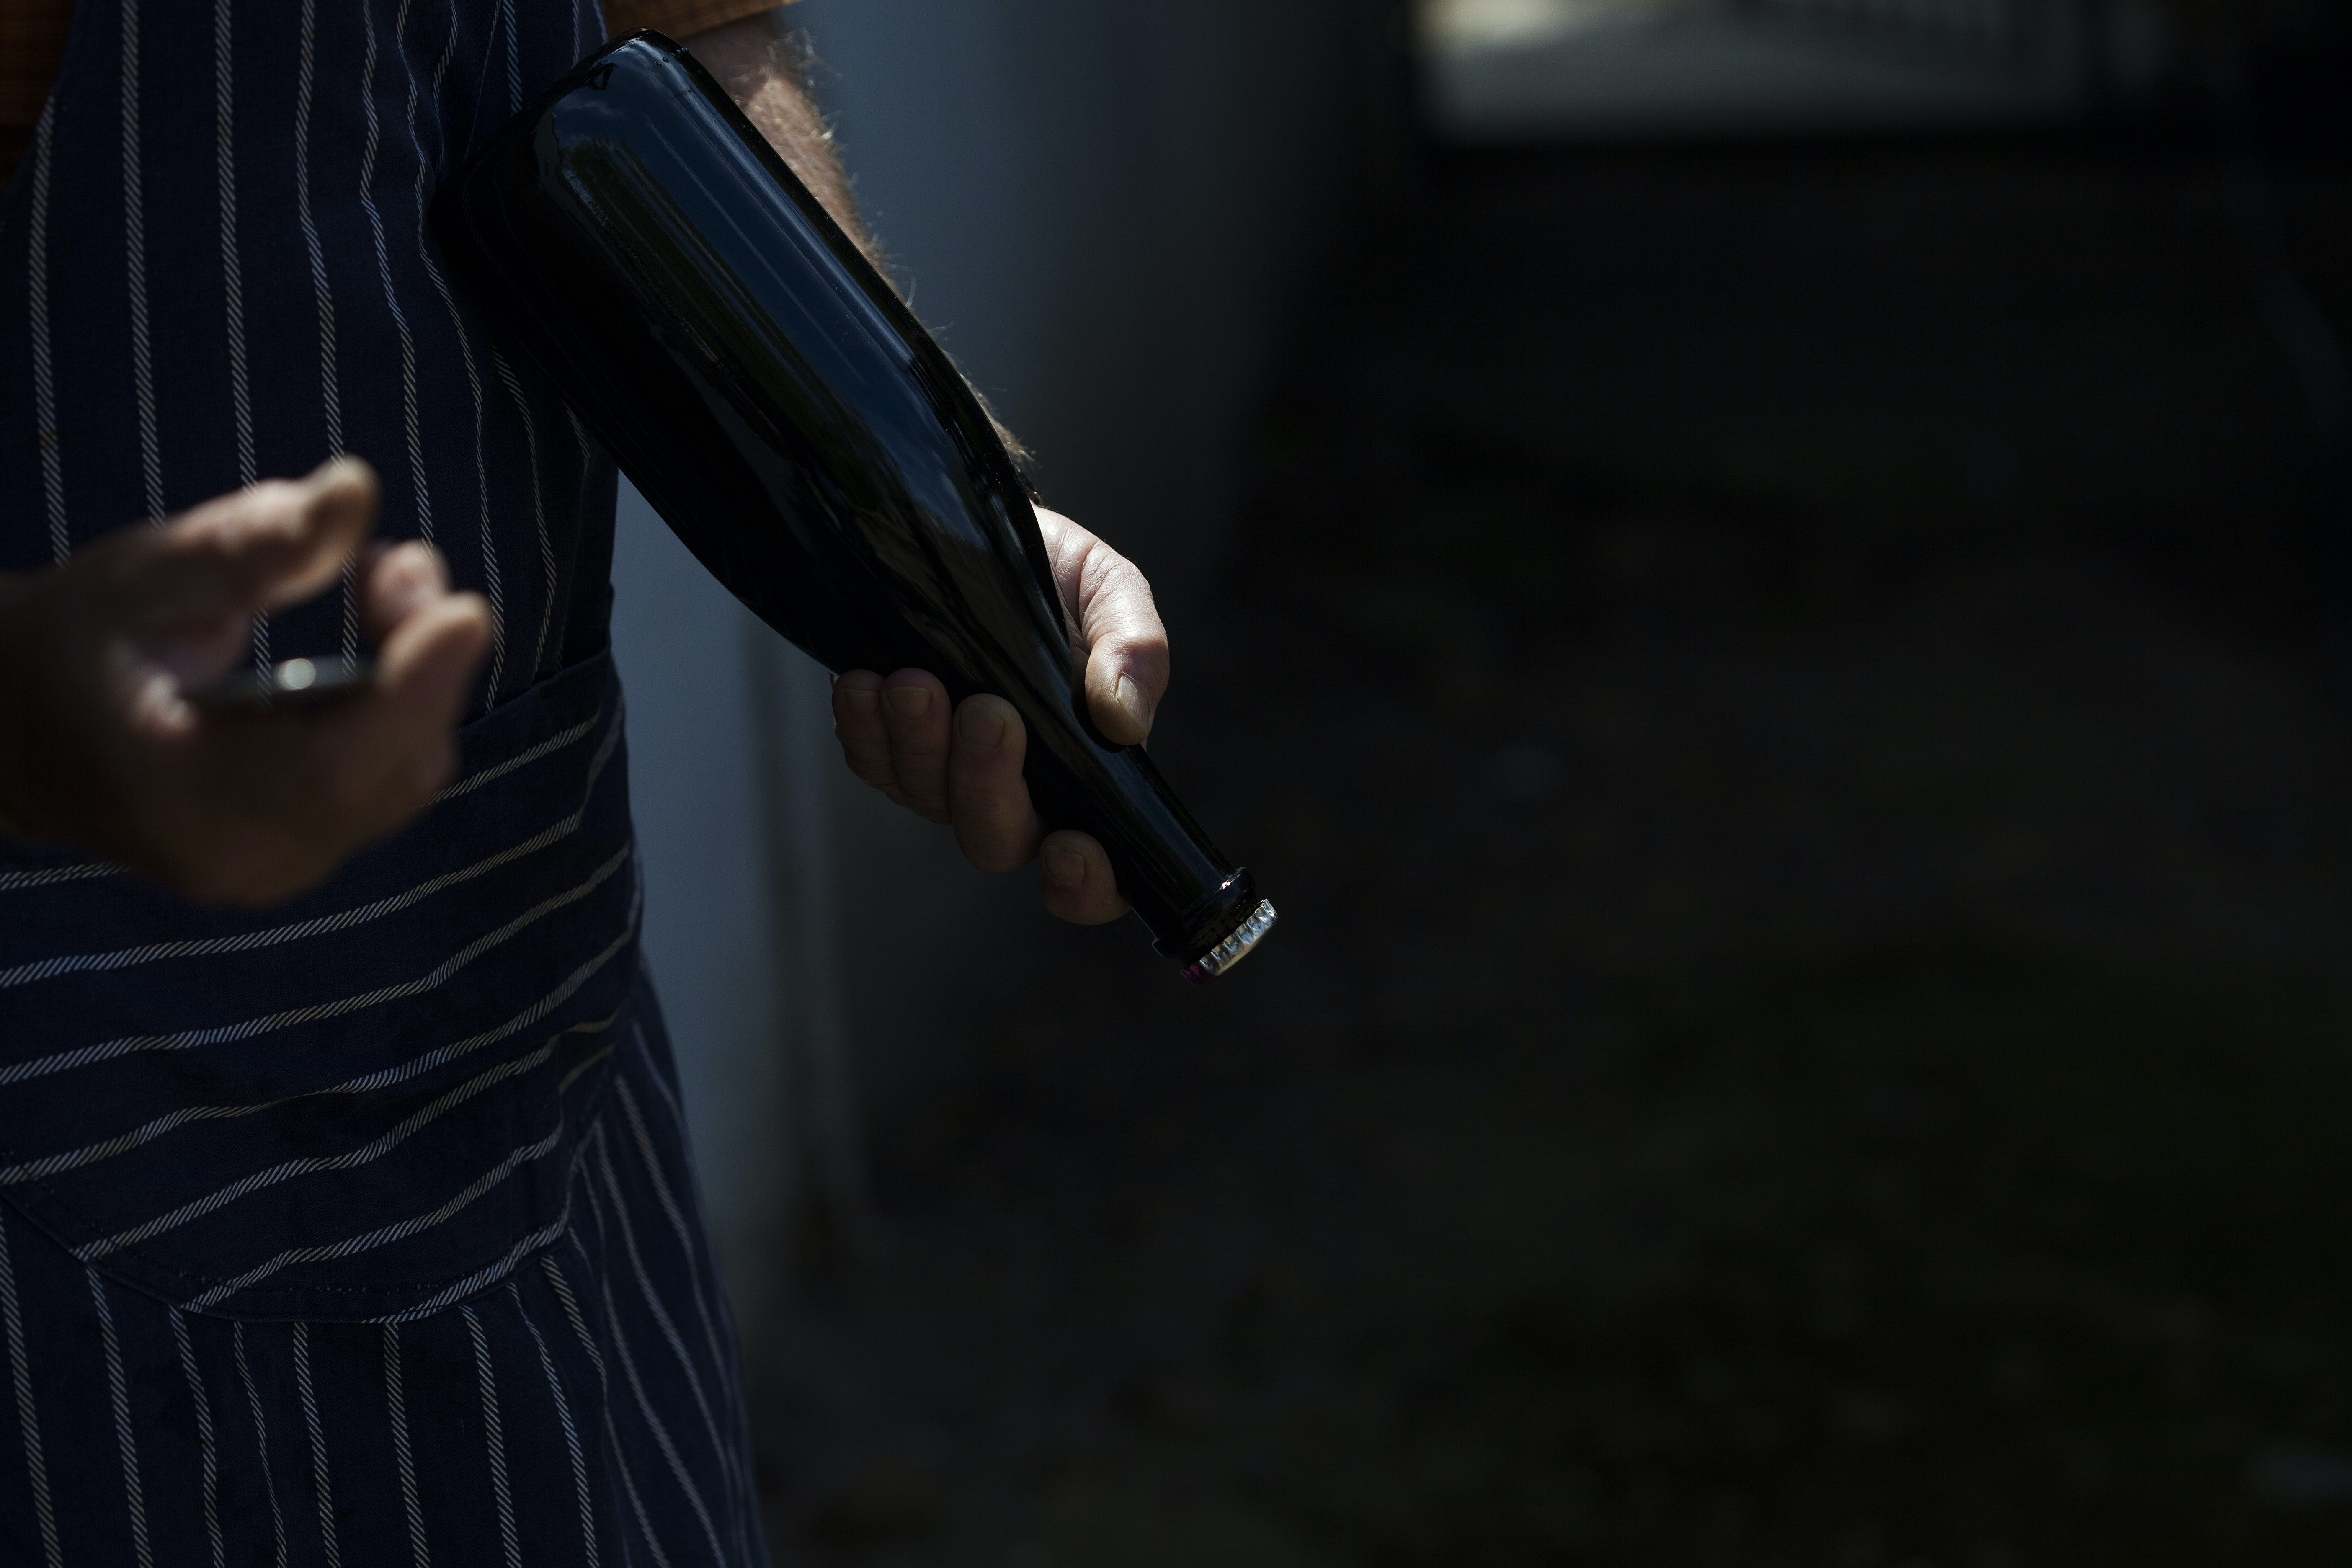 person holding black glass bottle